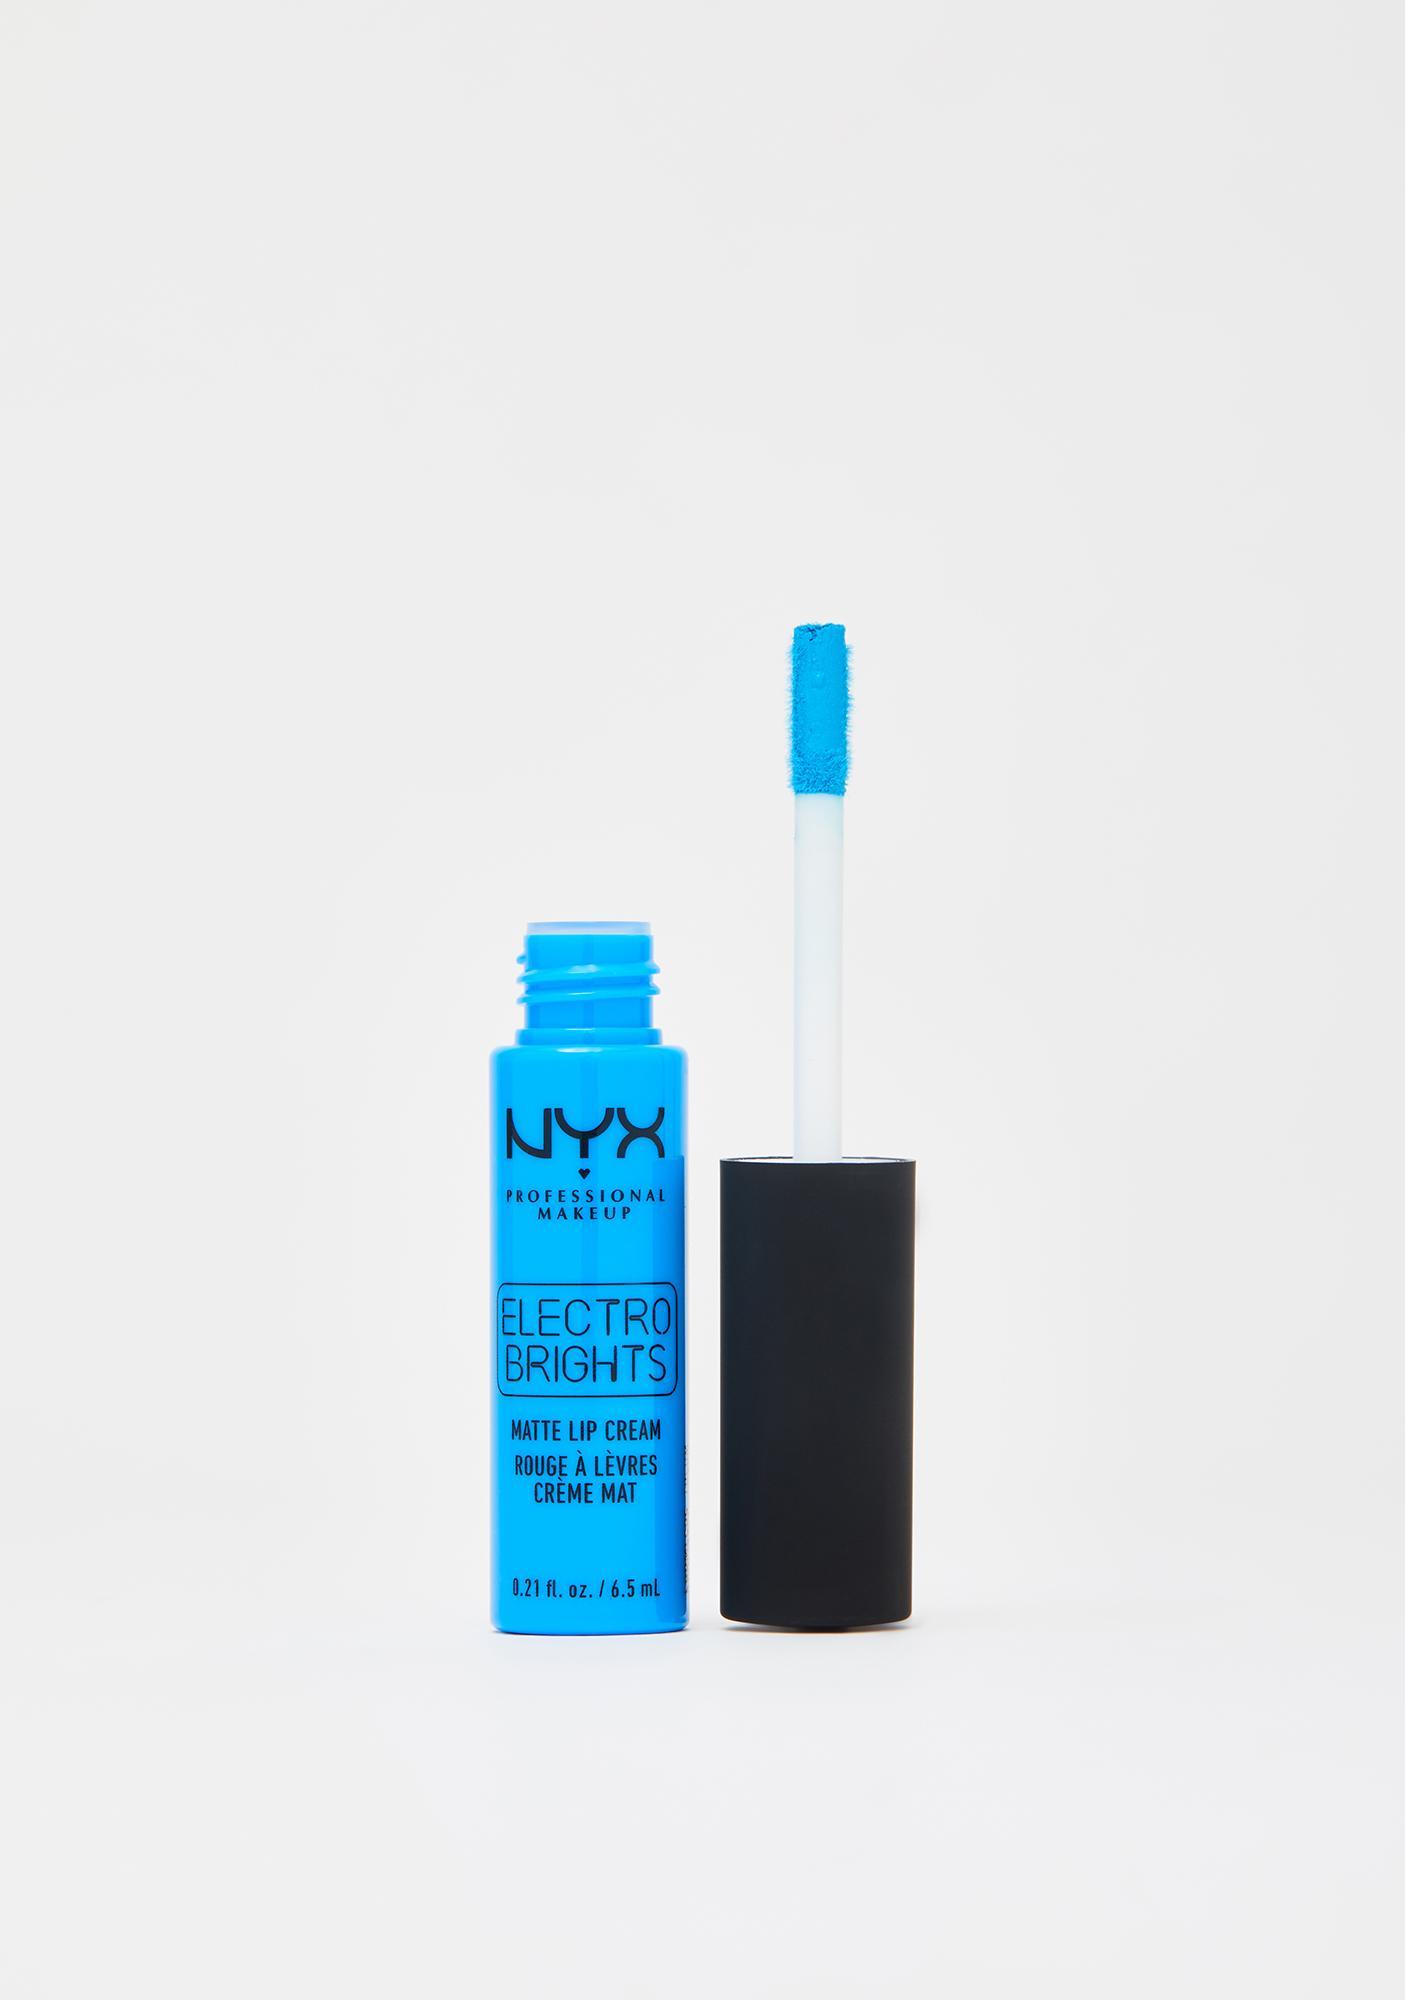 Tulum Electro Brights Matte Lip Cream by Nyx Professional Makeup